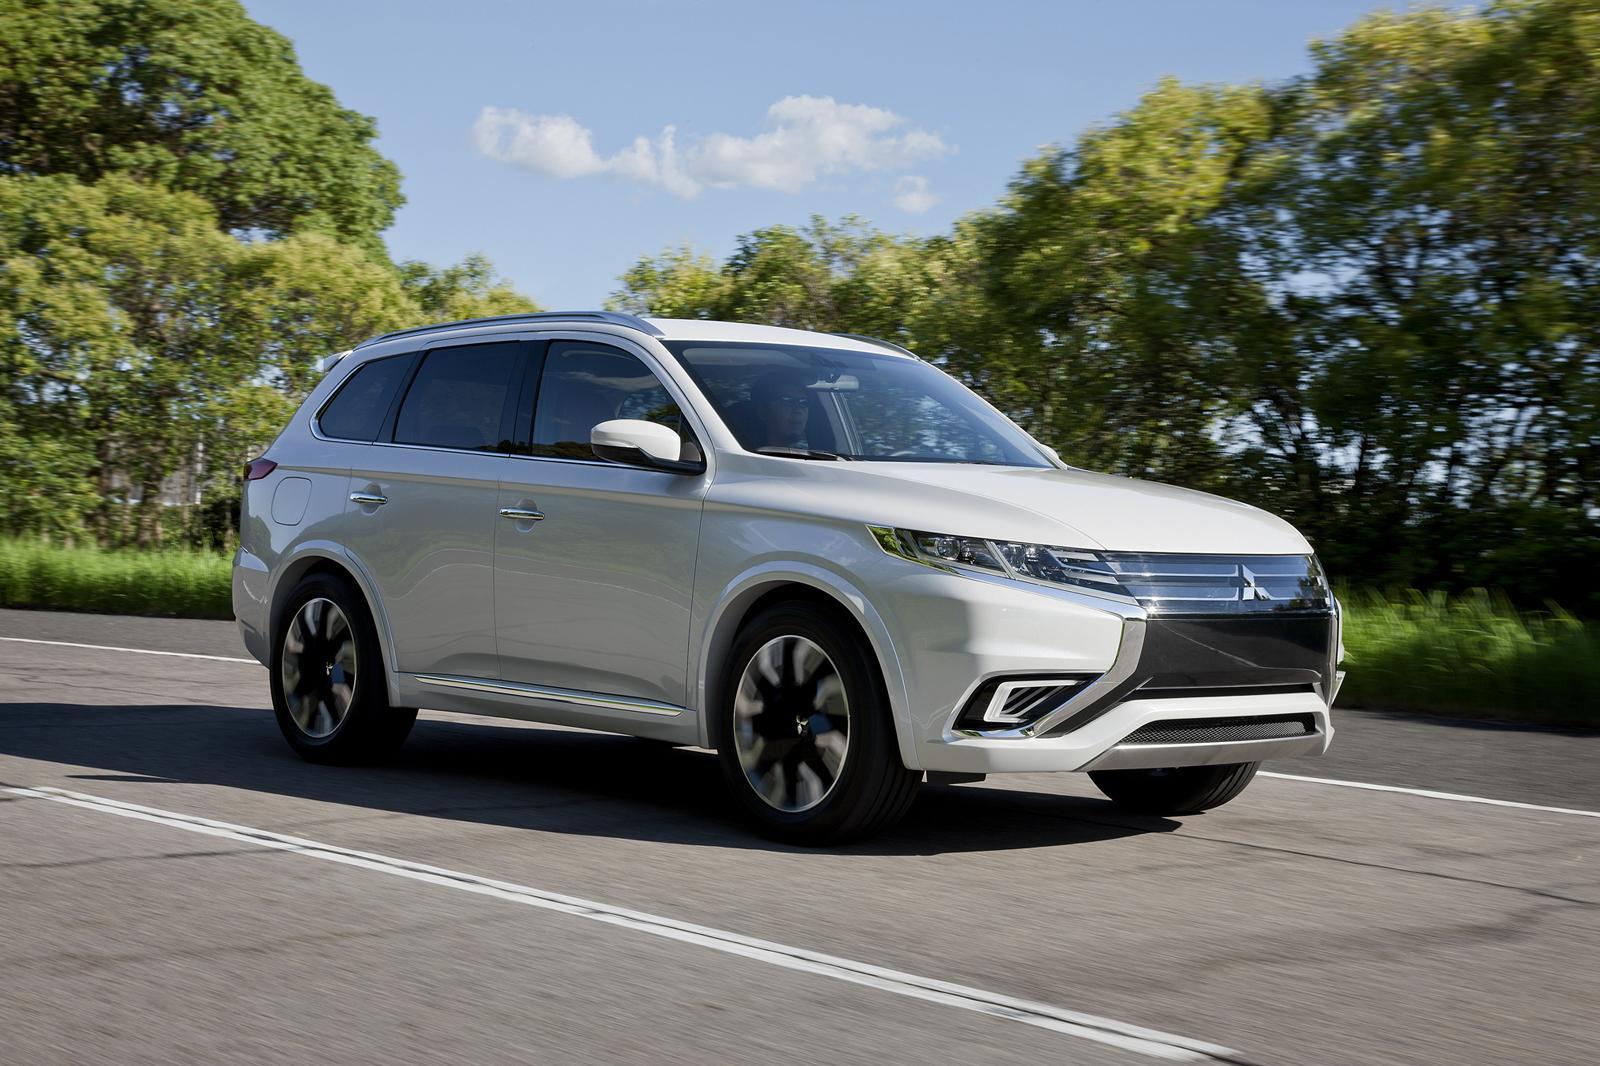 Mitsubishi Outlander Phev Concept S Unveiled Ahead Of Paris Debut Forcegt Com